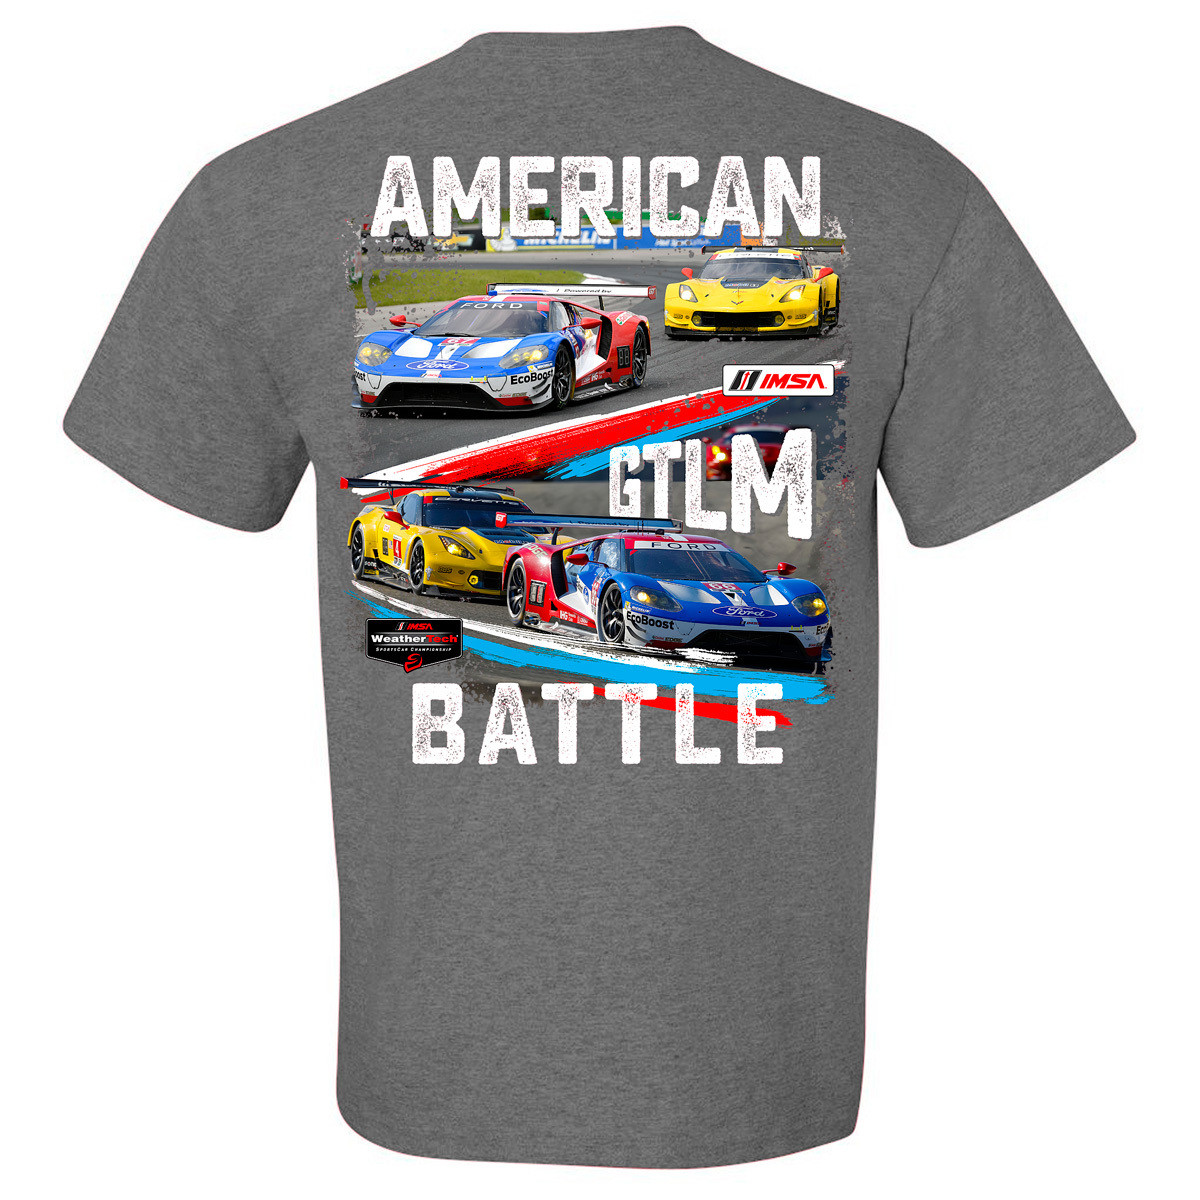 American Battle - Ford vs. Chevy Tee - Graphite Tri-Blend